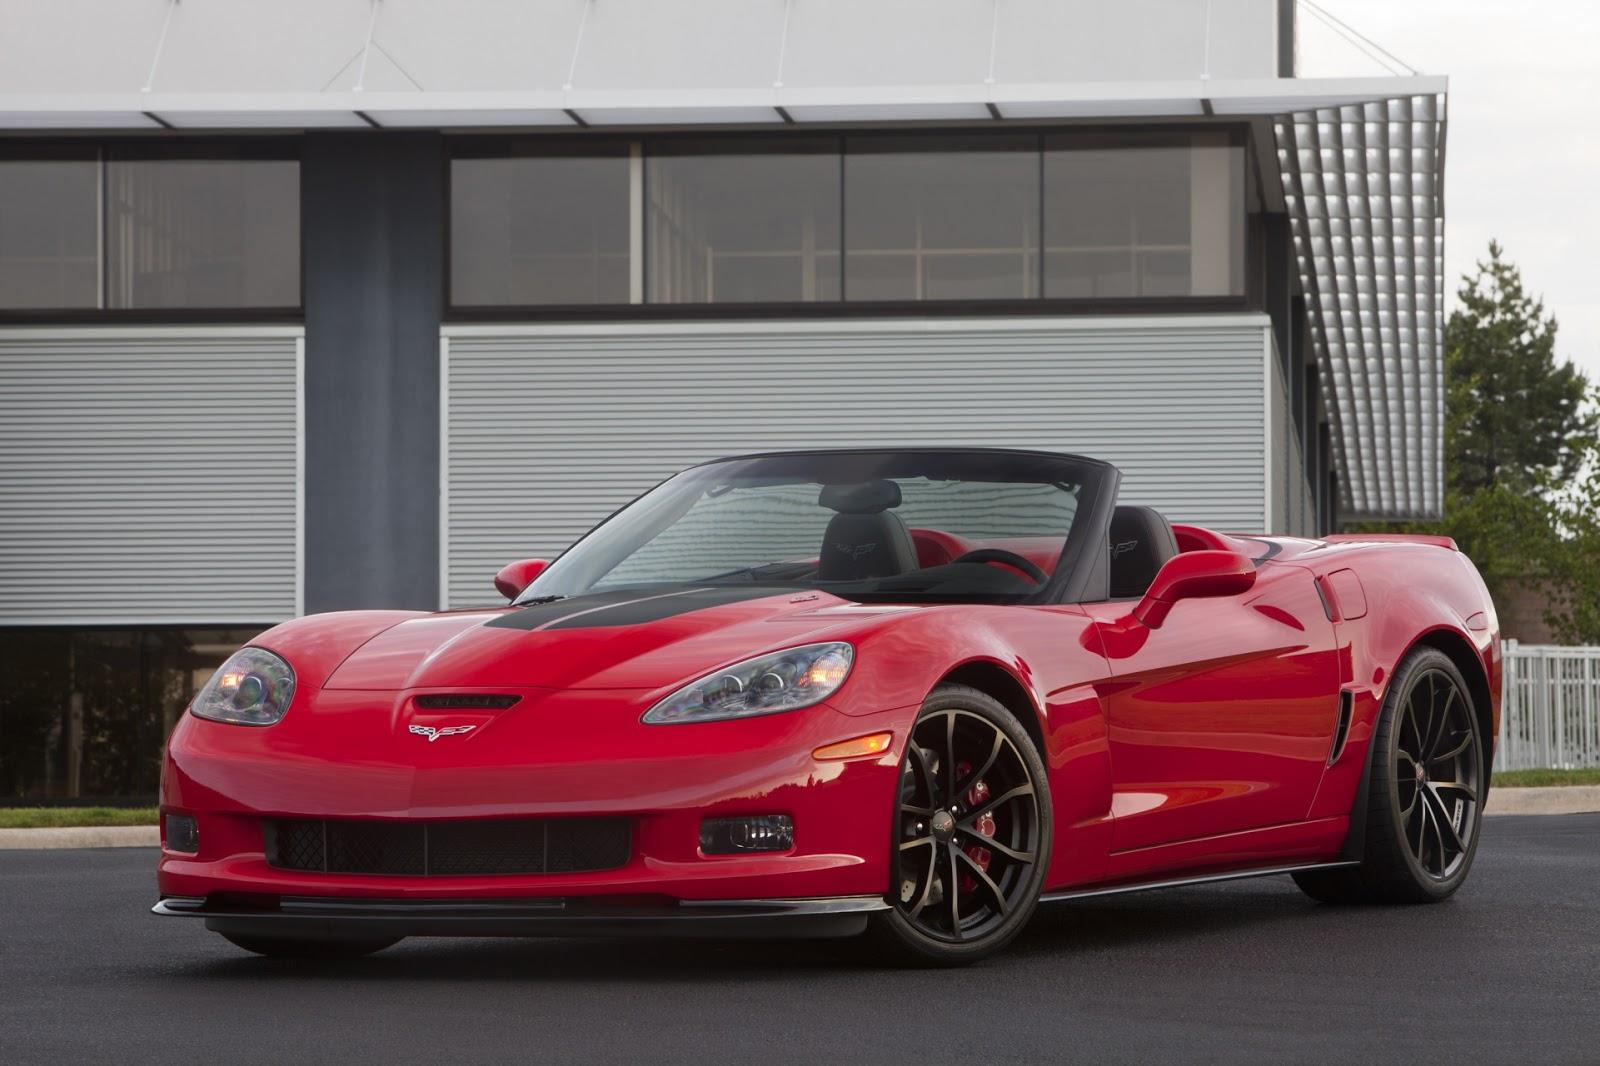 http://1.bp.blogspot.com/-M5bKRq3pF50/ULzSeChMmoI/AAAAAAAAEqw/U1Uh07Qt-2w/s1600/2012+Chevrolet+Corvette+%2528C6%2529+427+Convertible+%25282013%2529.jpg